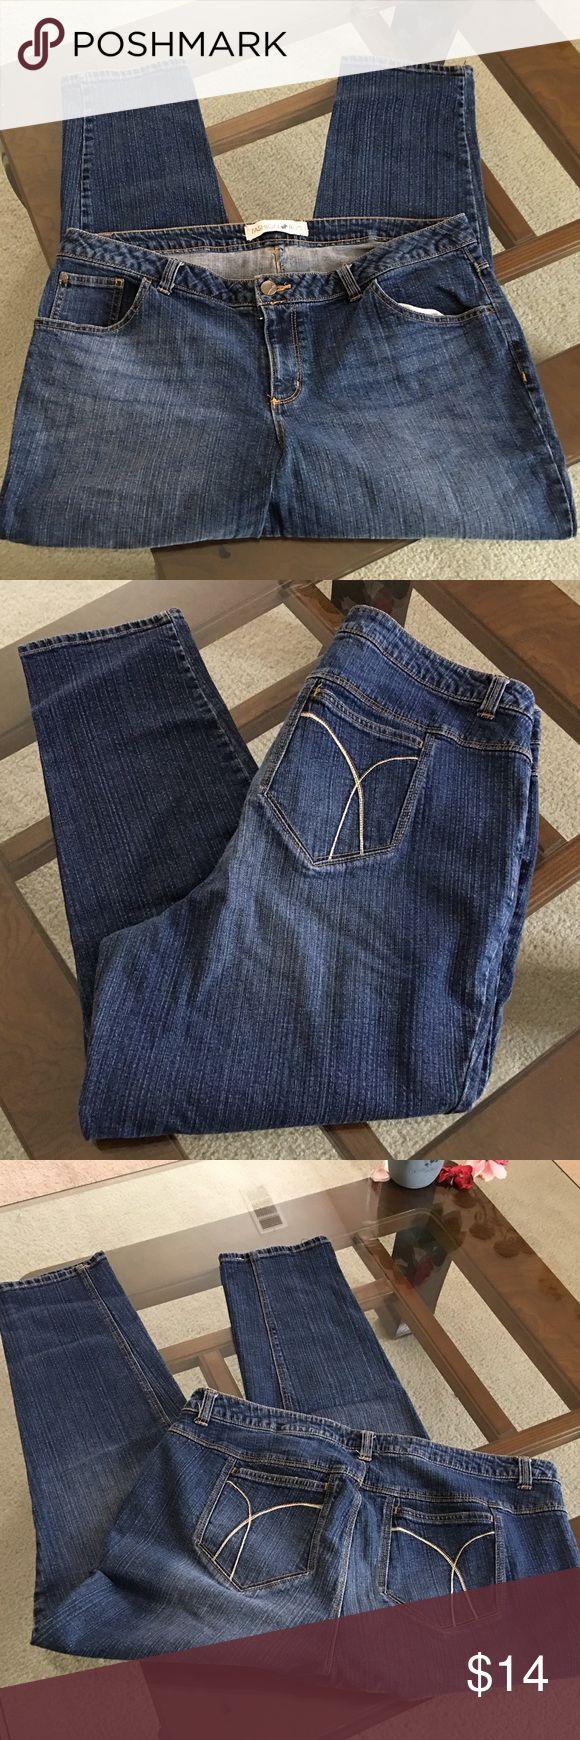 "Fashion bug 20 WP petite SKINNY jeans FASHION BUG sz 20WP petite, skinny, stretch cotton/spandex, waist = 40"" inseam = 28"", very good used condition. Fashion Bug Jeans Skinny"